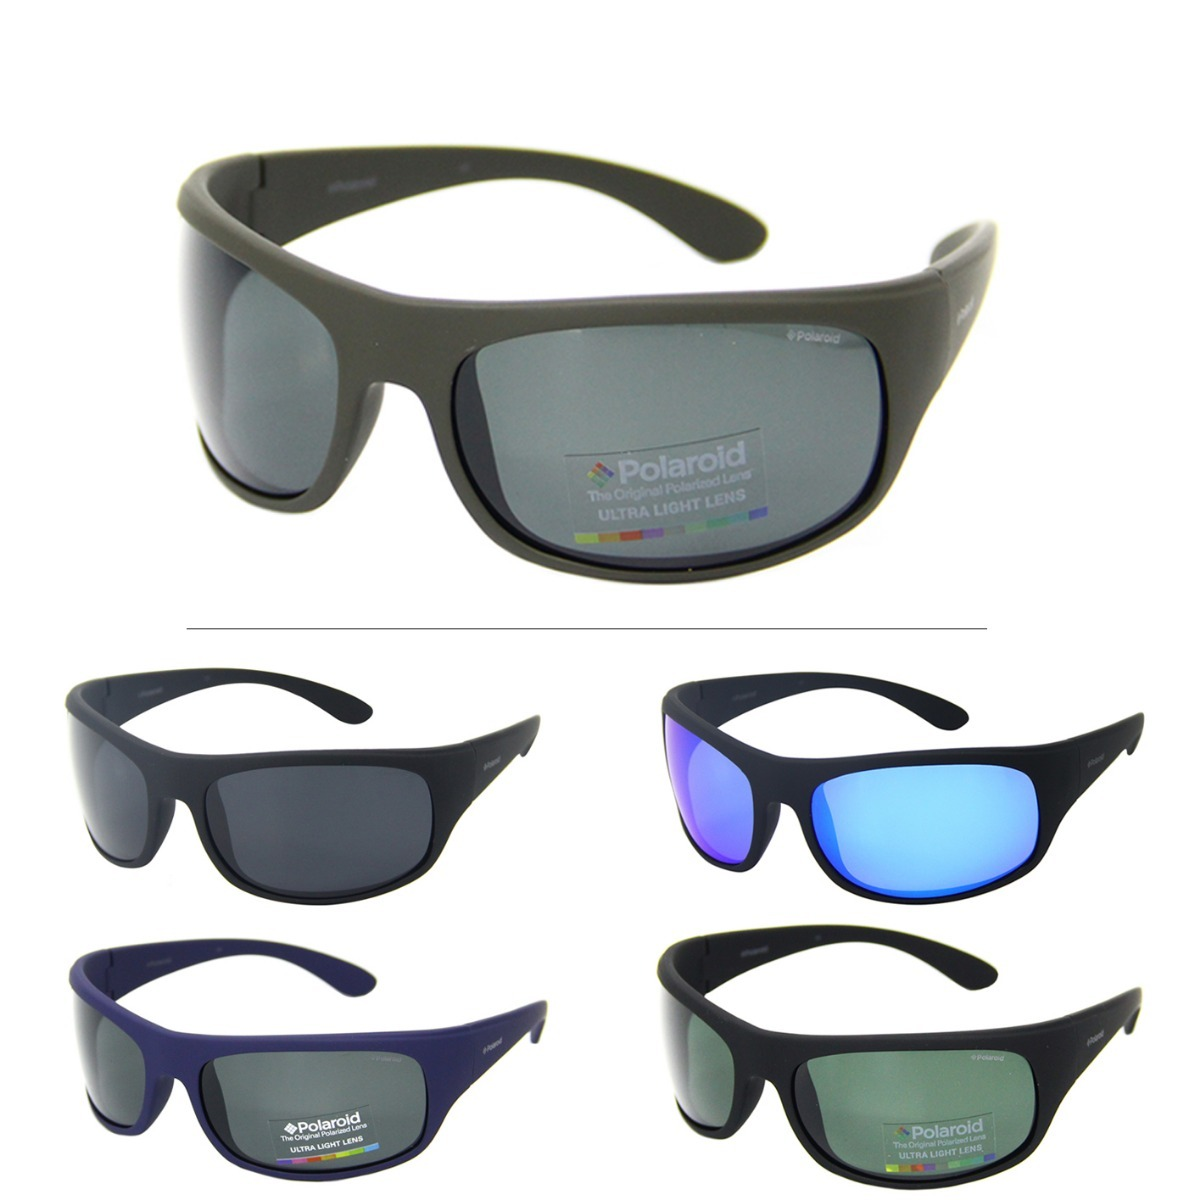 Óculos Solar Masculino Polaroid 7886 Flexível - R  179,45 em Mercado ... 8cd940b389